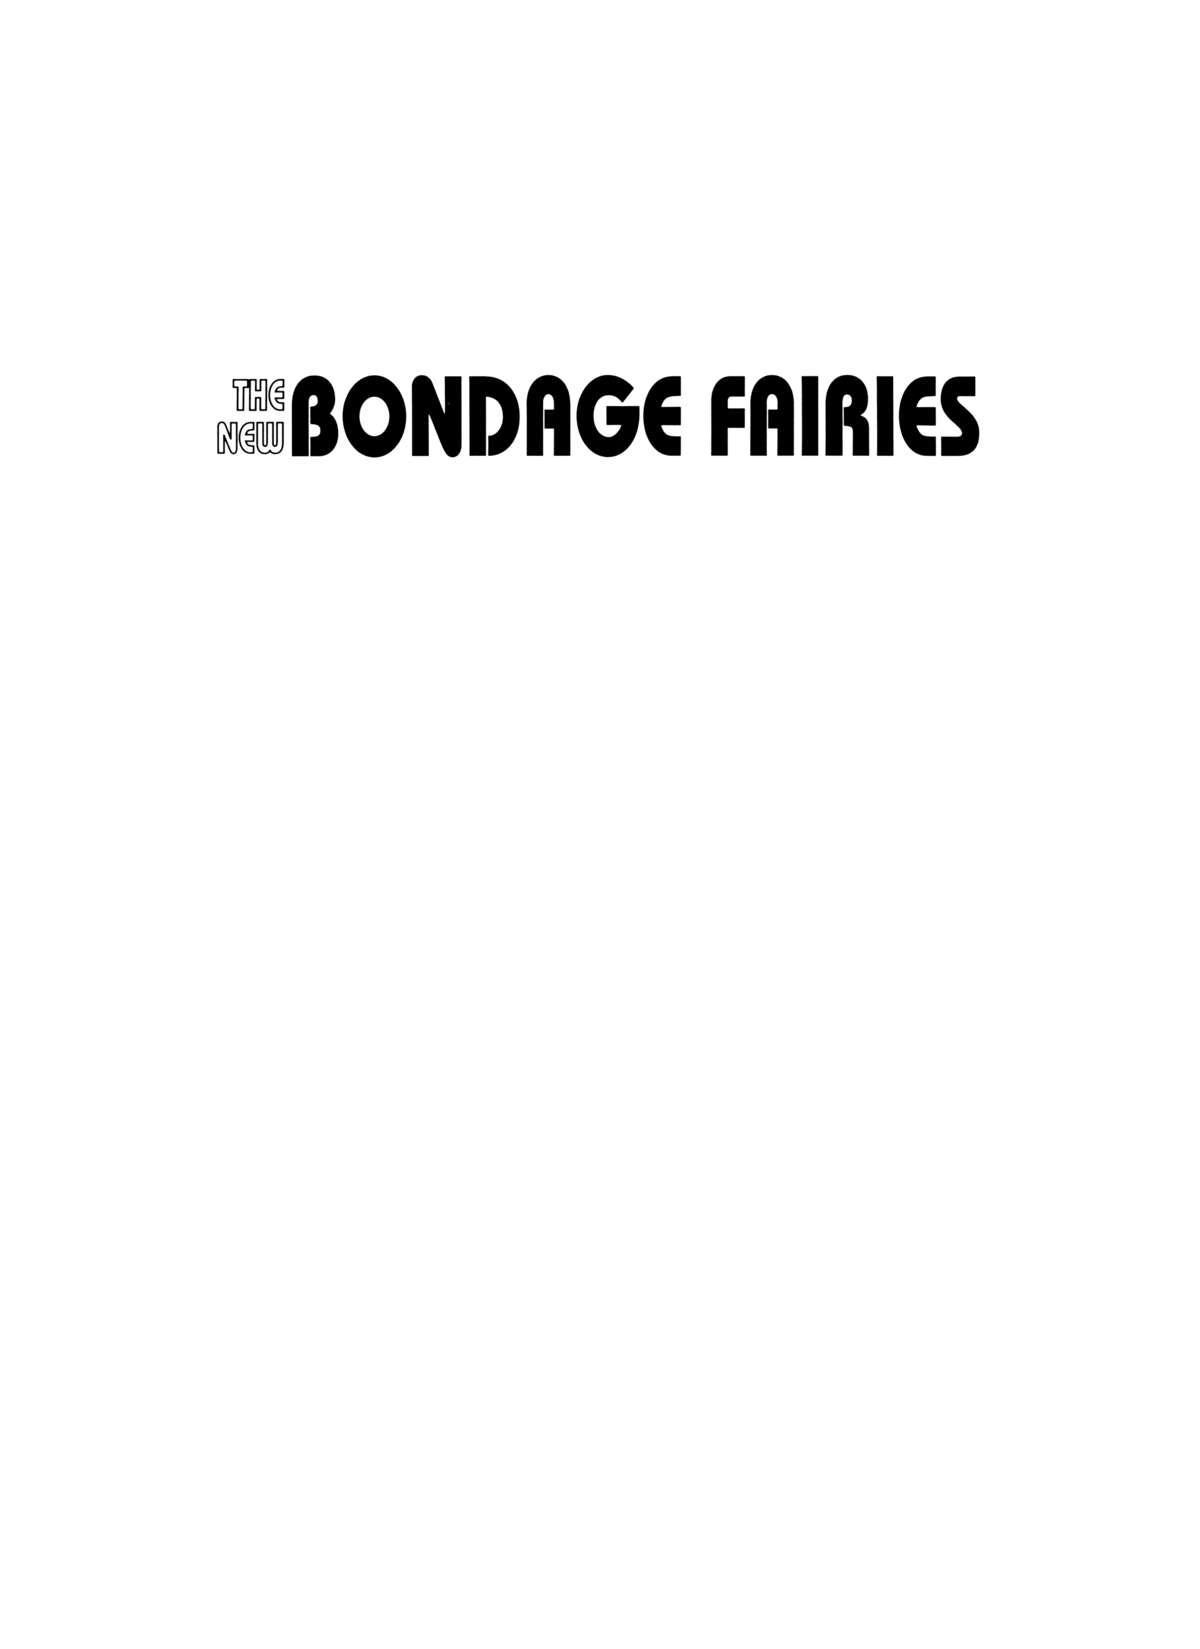 The New Bondage Fairies - Book One 1